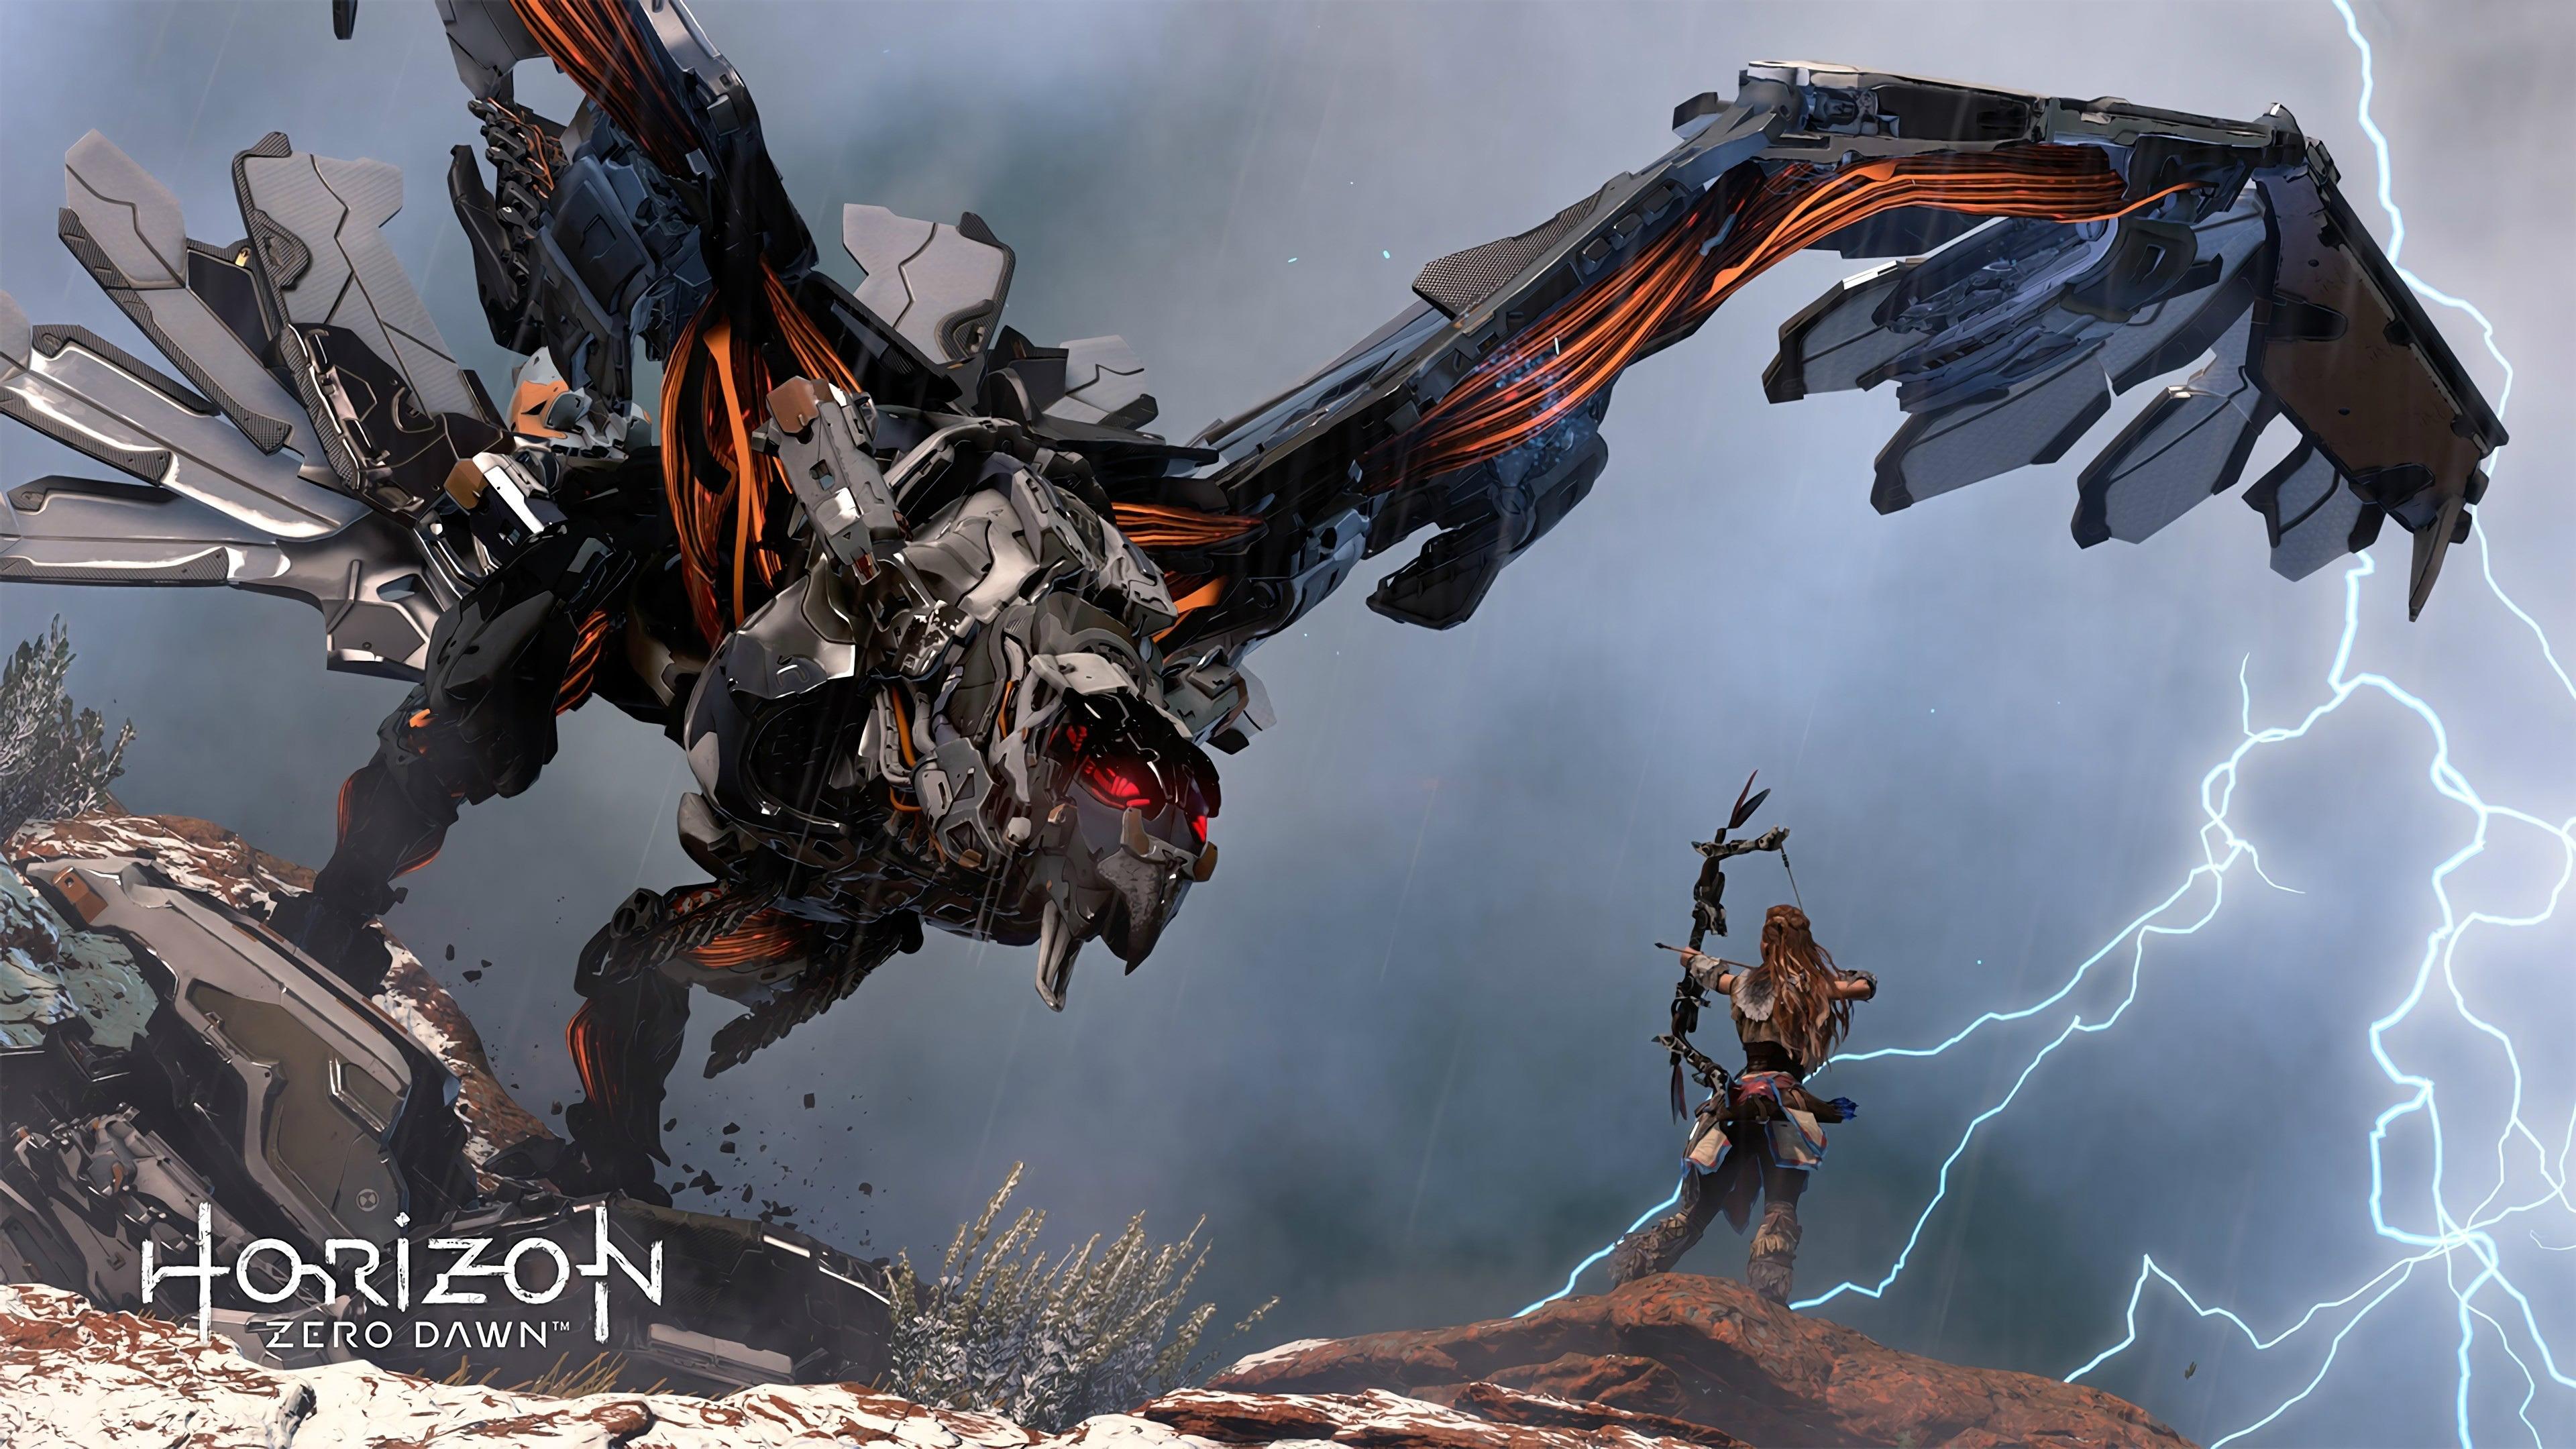 Horizon Zero Dawn Video Game Hd Games 4k Wallpapers